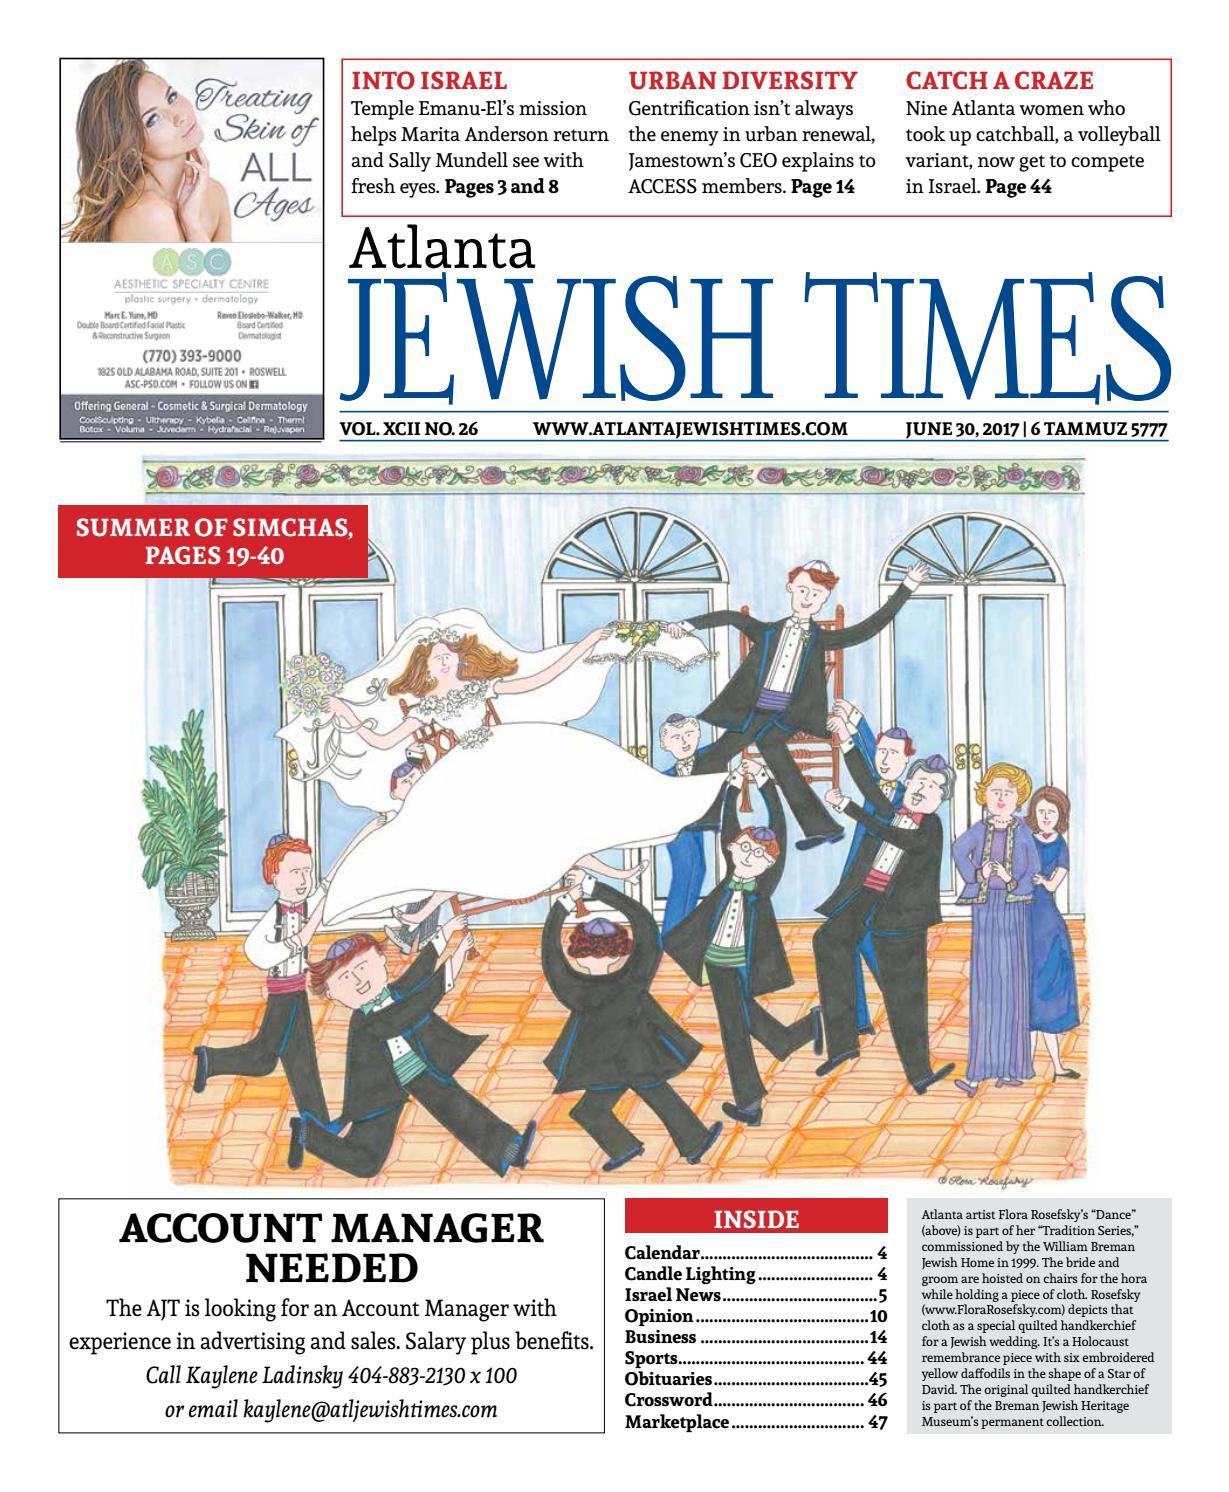 Atlanta Jewish Times 9e9c3b4bf833